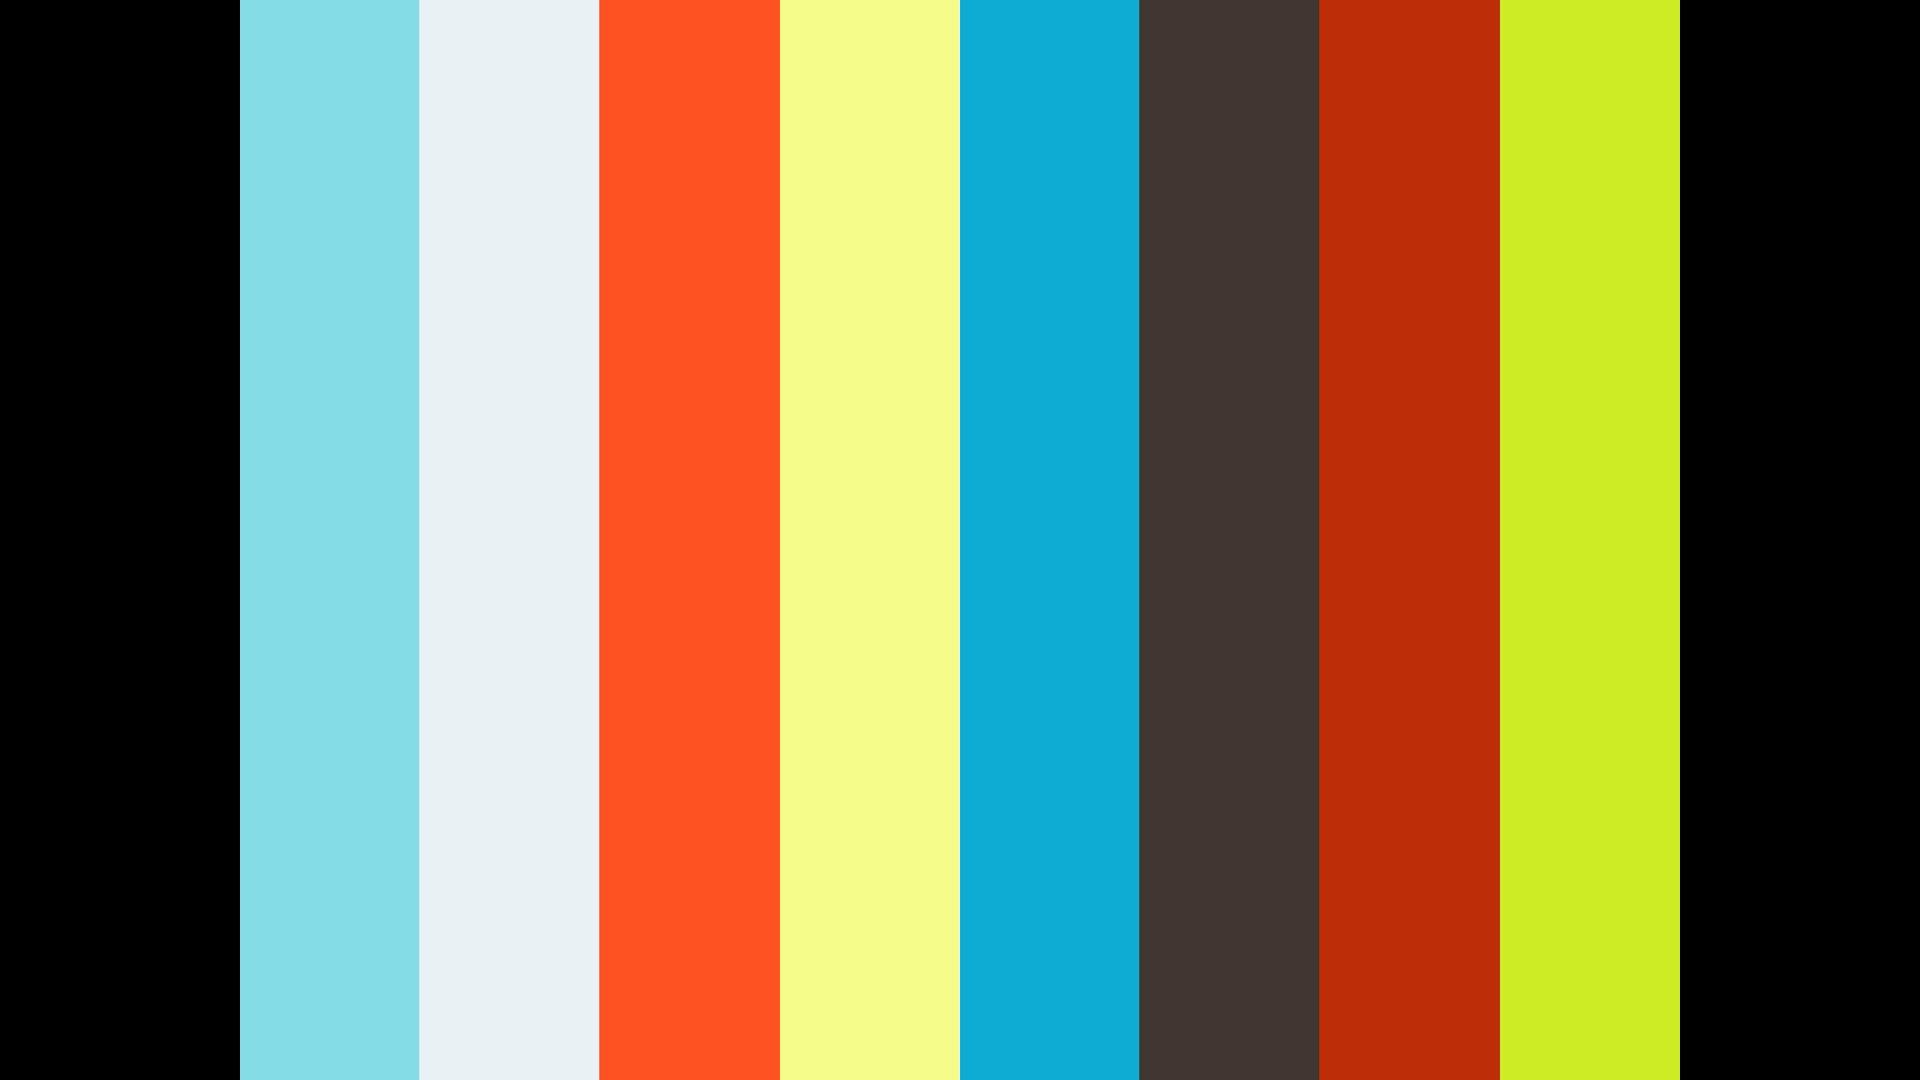 Sligro kwaliteitsprijs - Twinning Media | Foxmountain